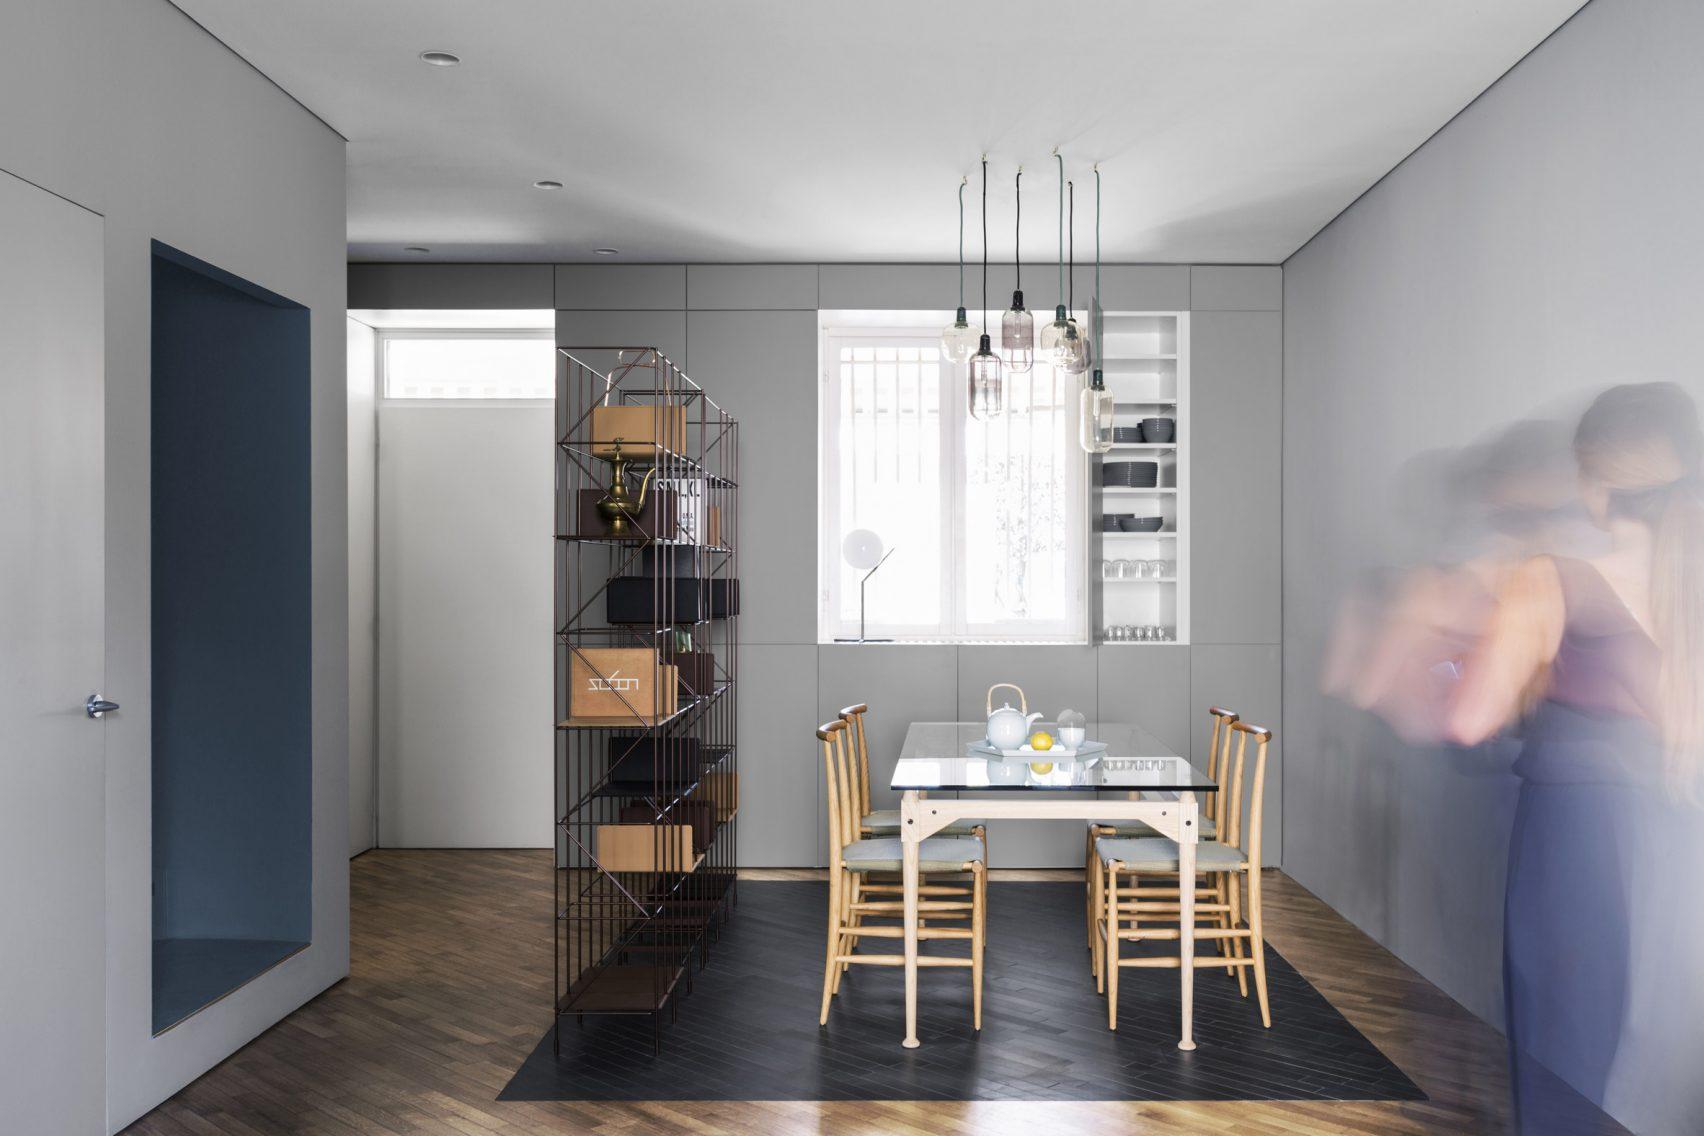 Keuken Wandkast 6 : Strakke moderne keuken met blauwe wandkast en zwart kookeiland